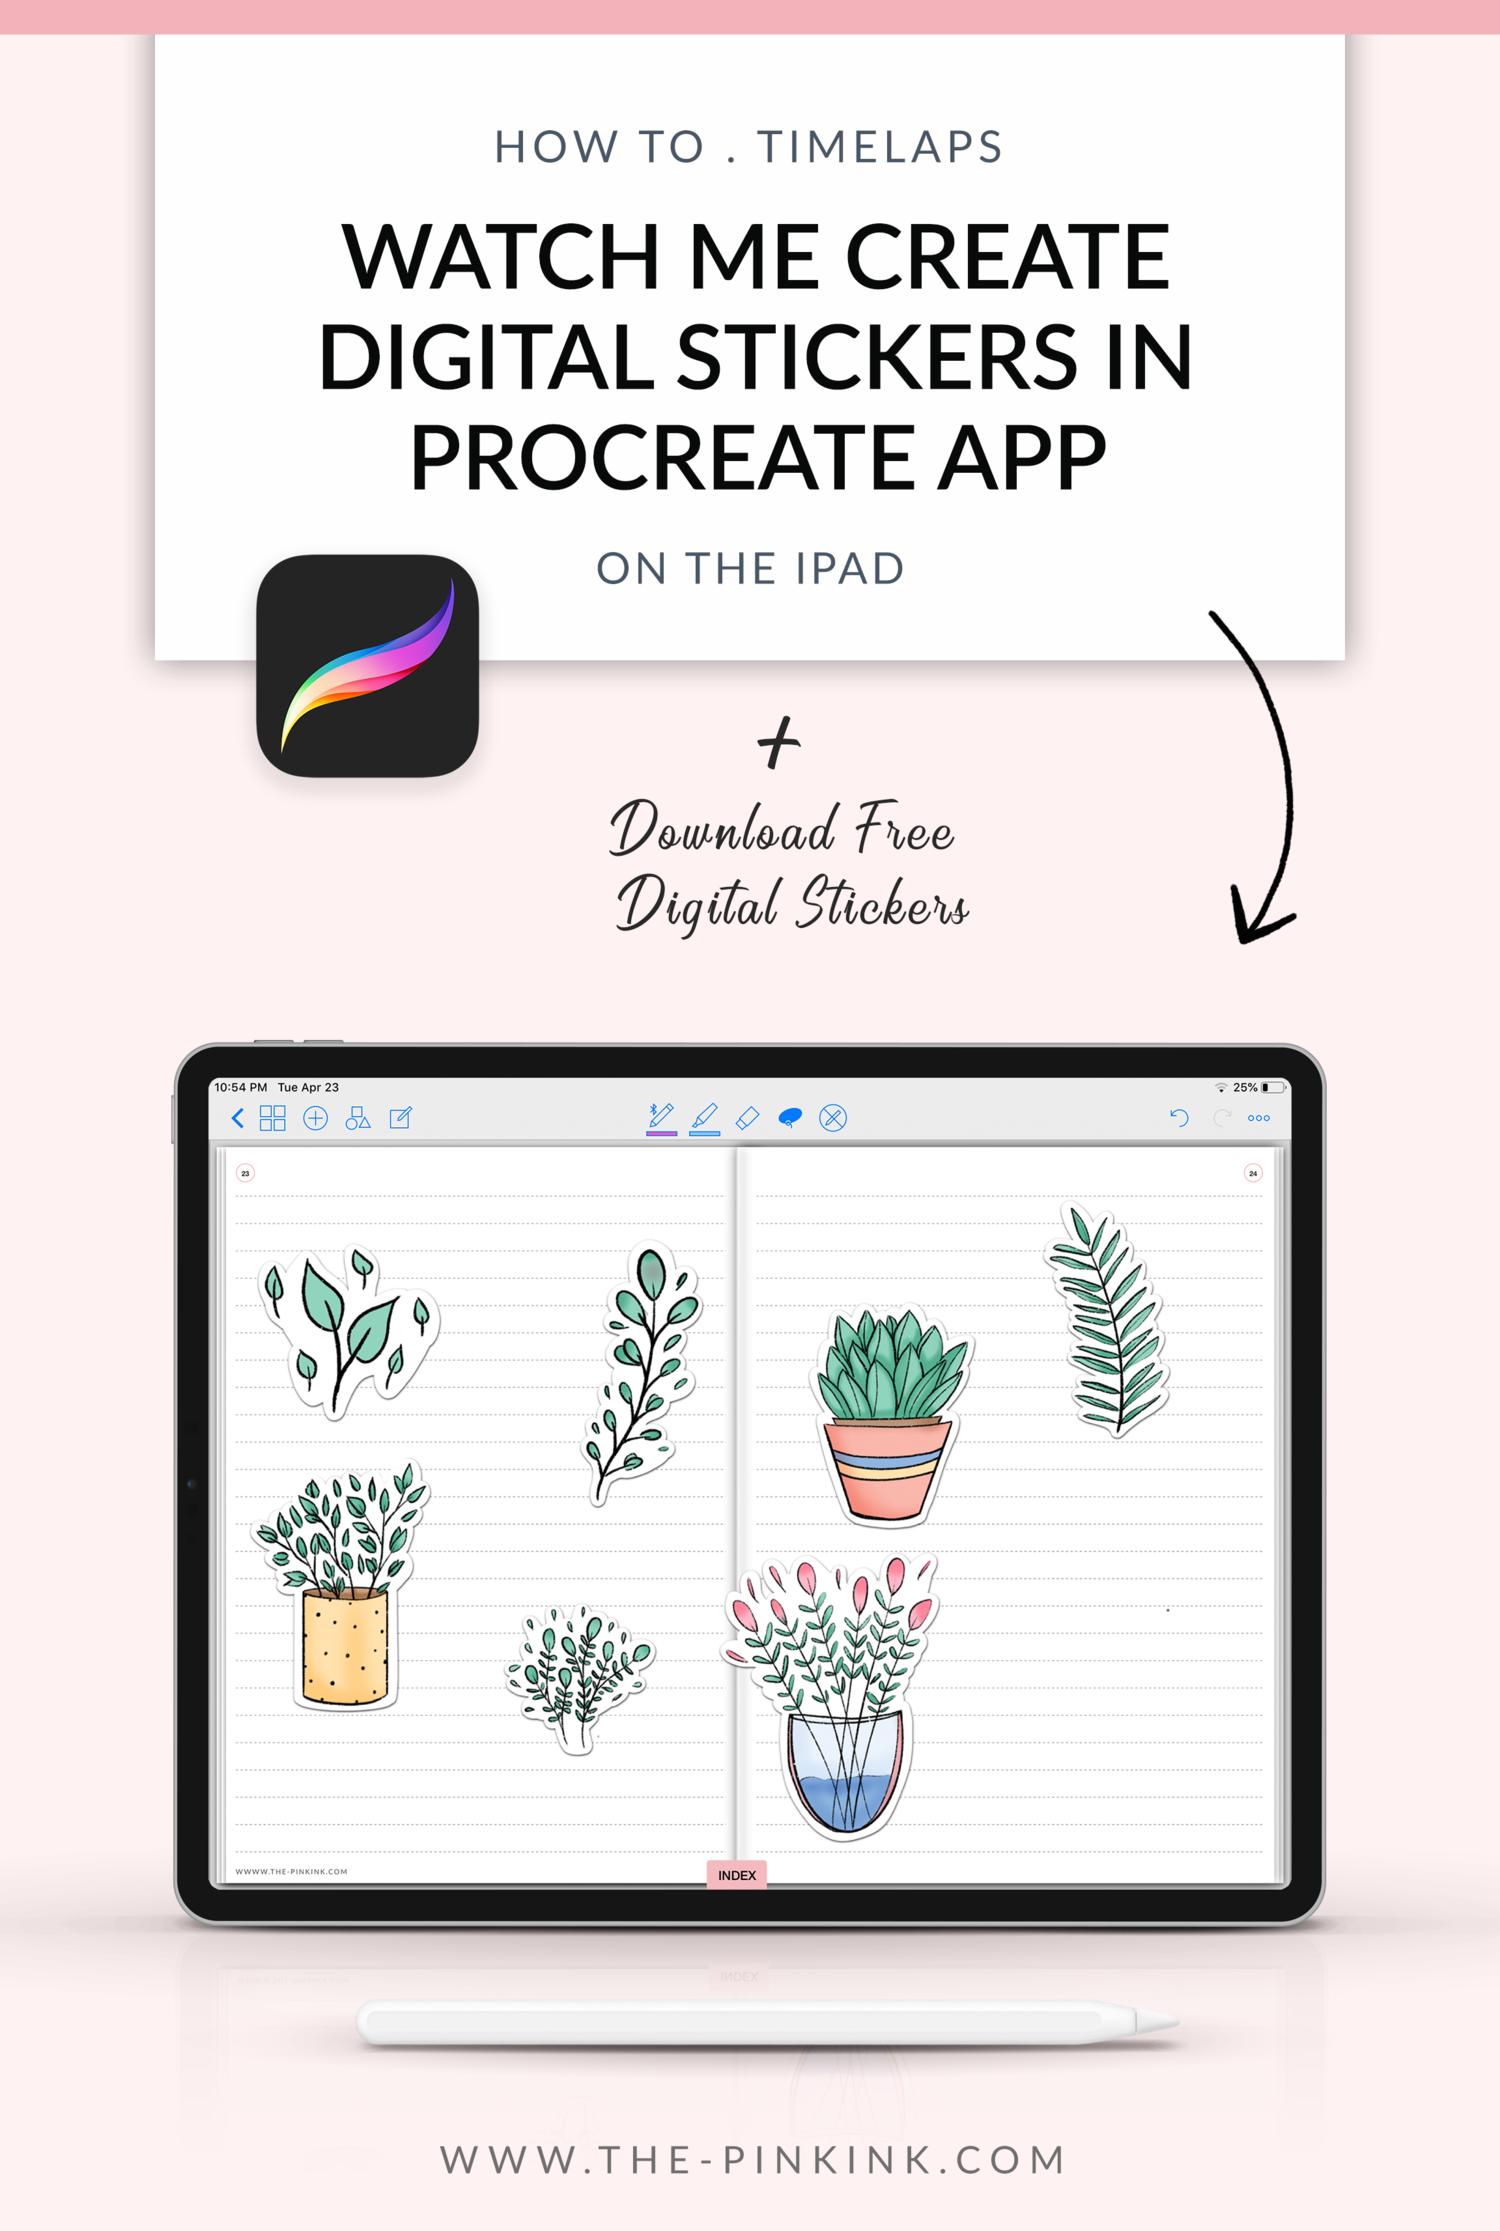 How to create Digital Stickers in Procreate app Ipad